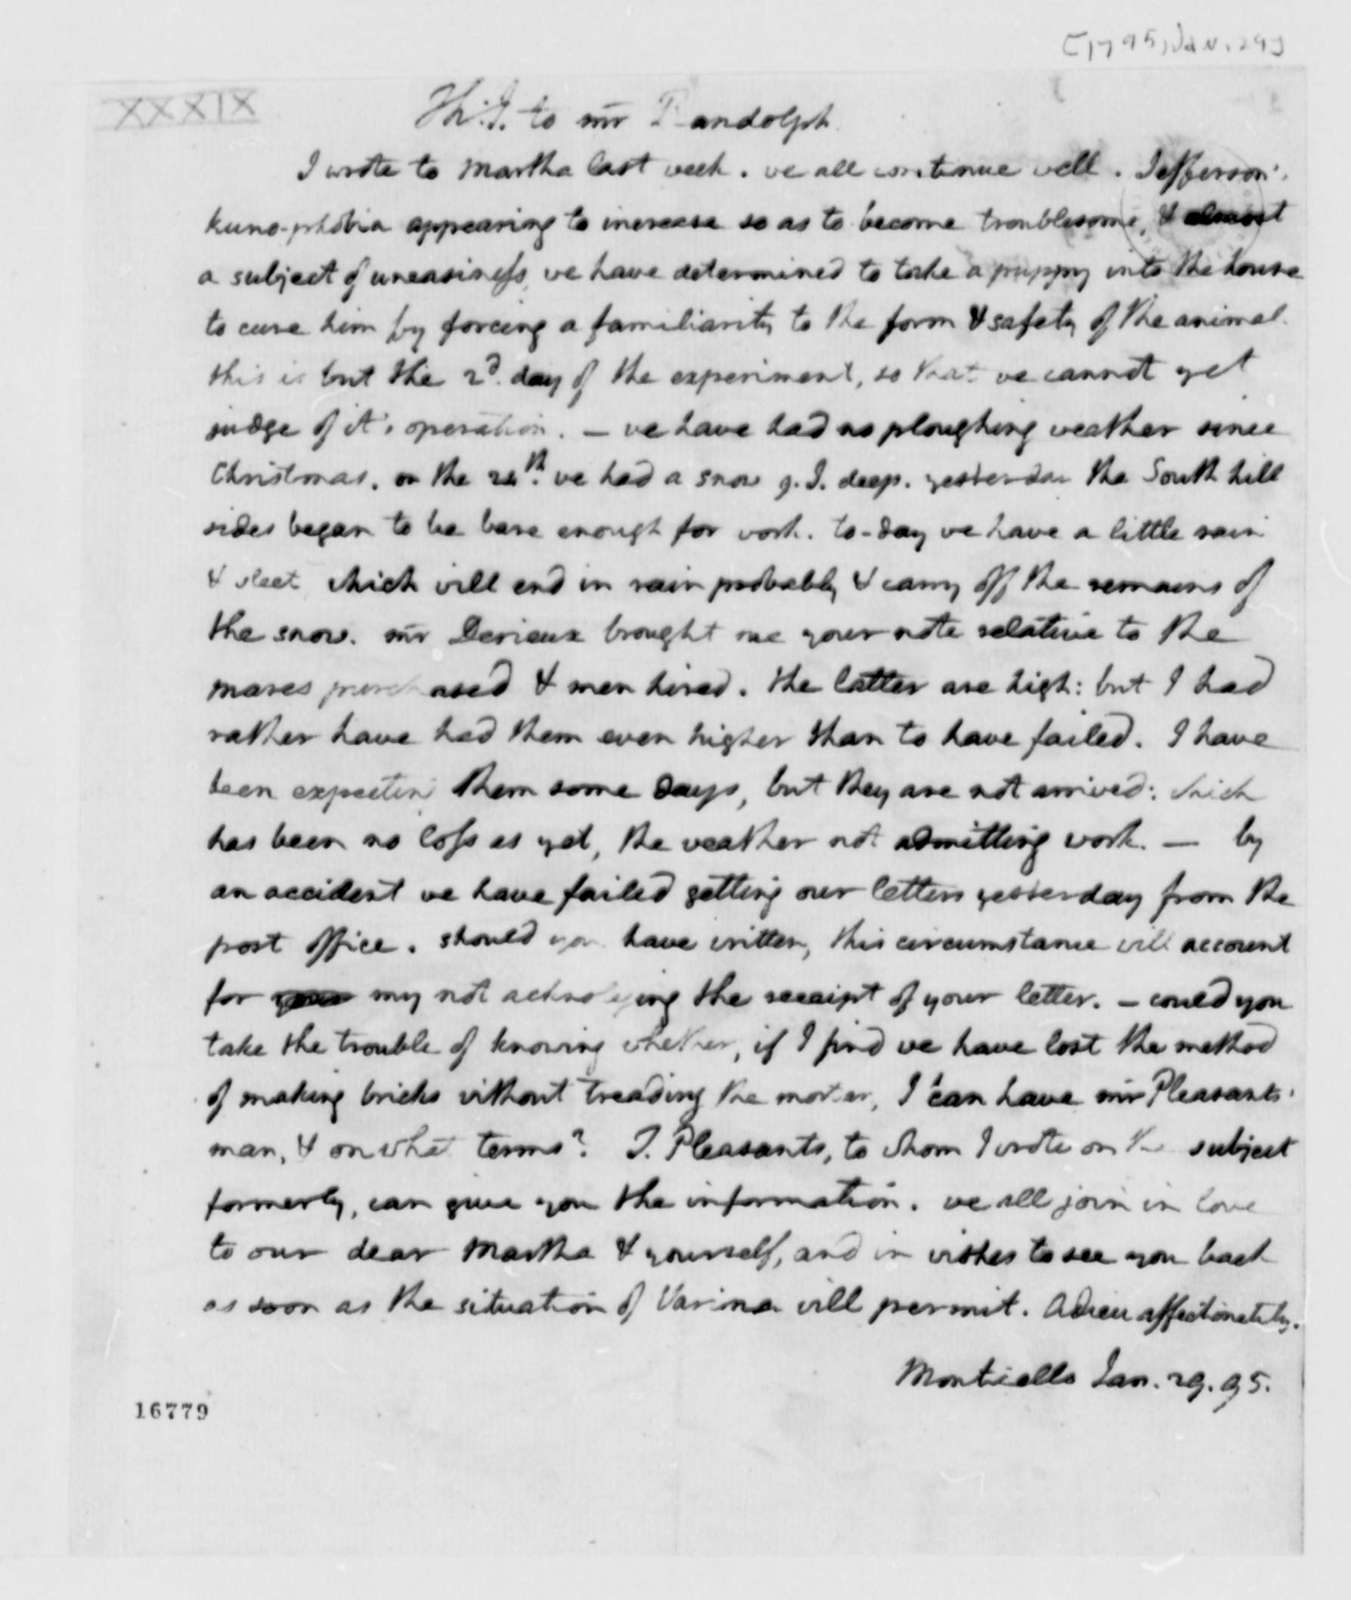 Thomas Jefferson to Thomas Mann Randolph, Jr., January 29, 1795